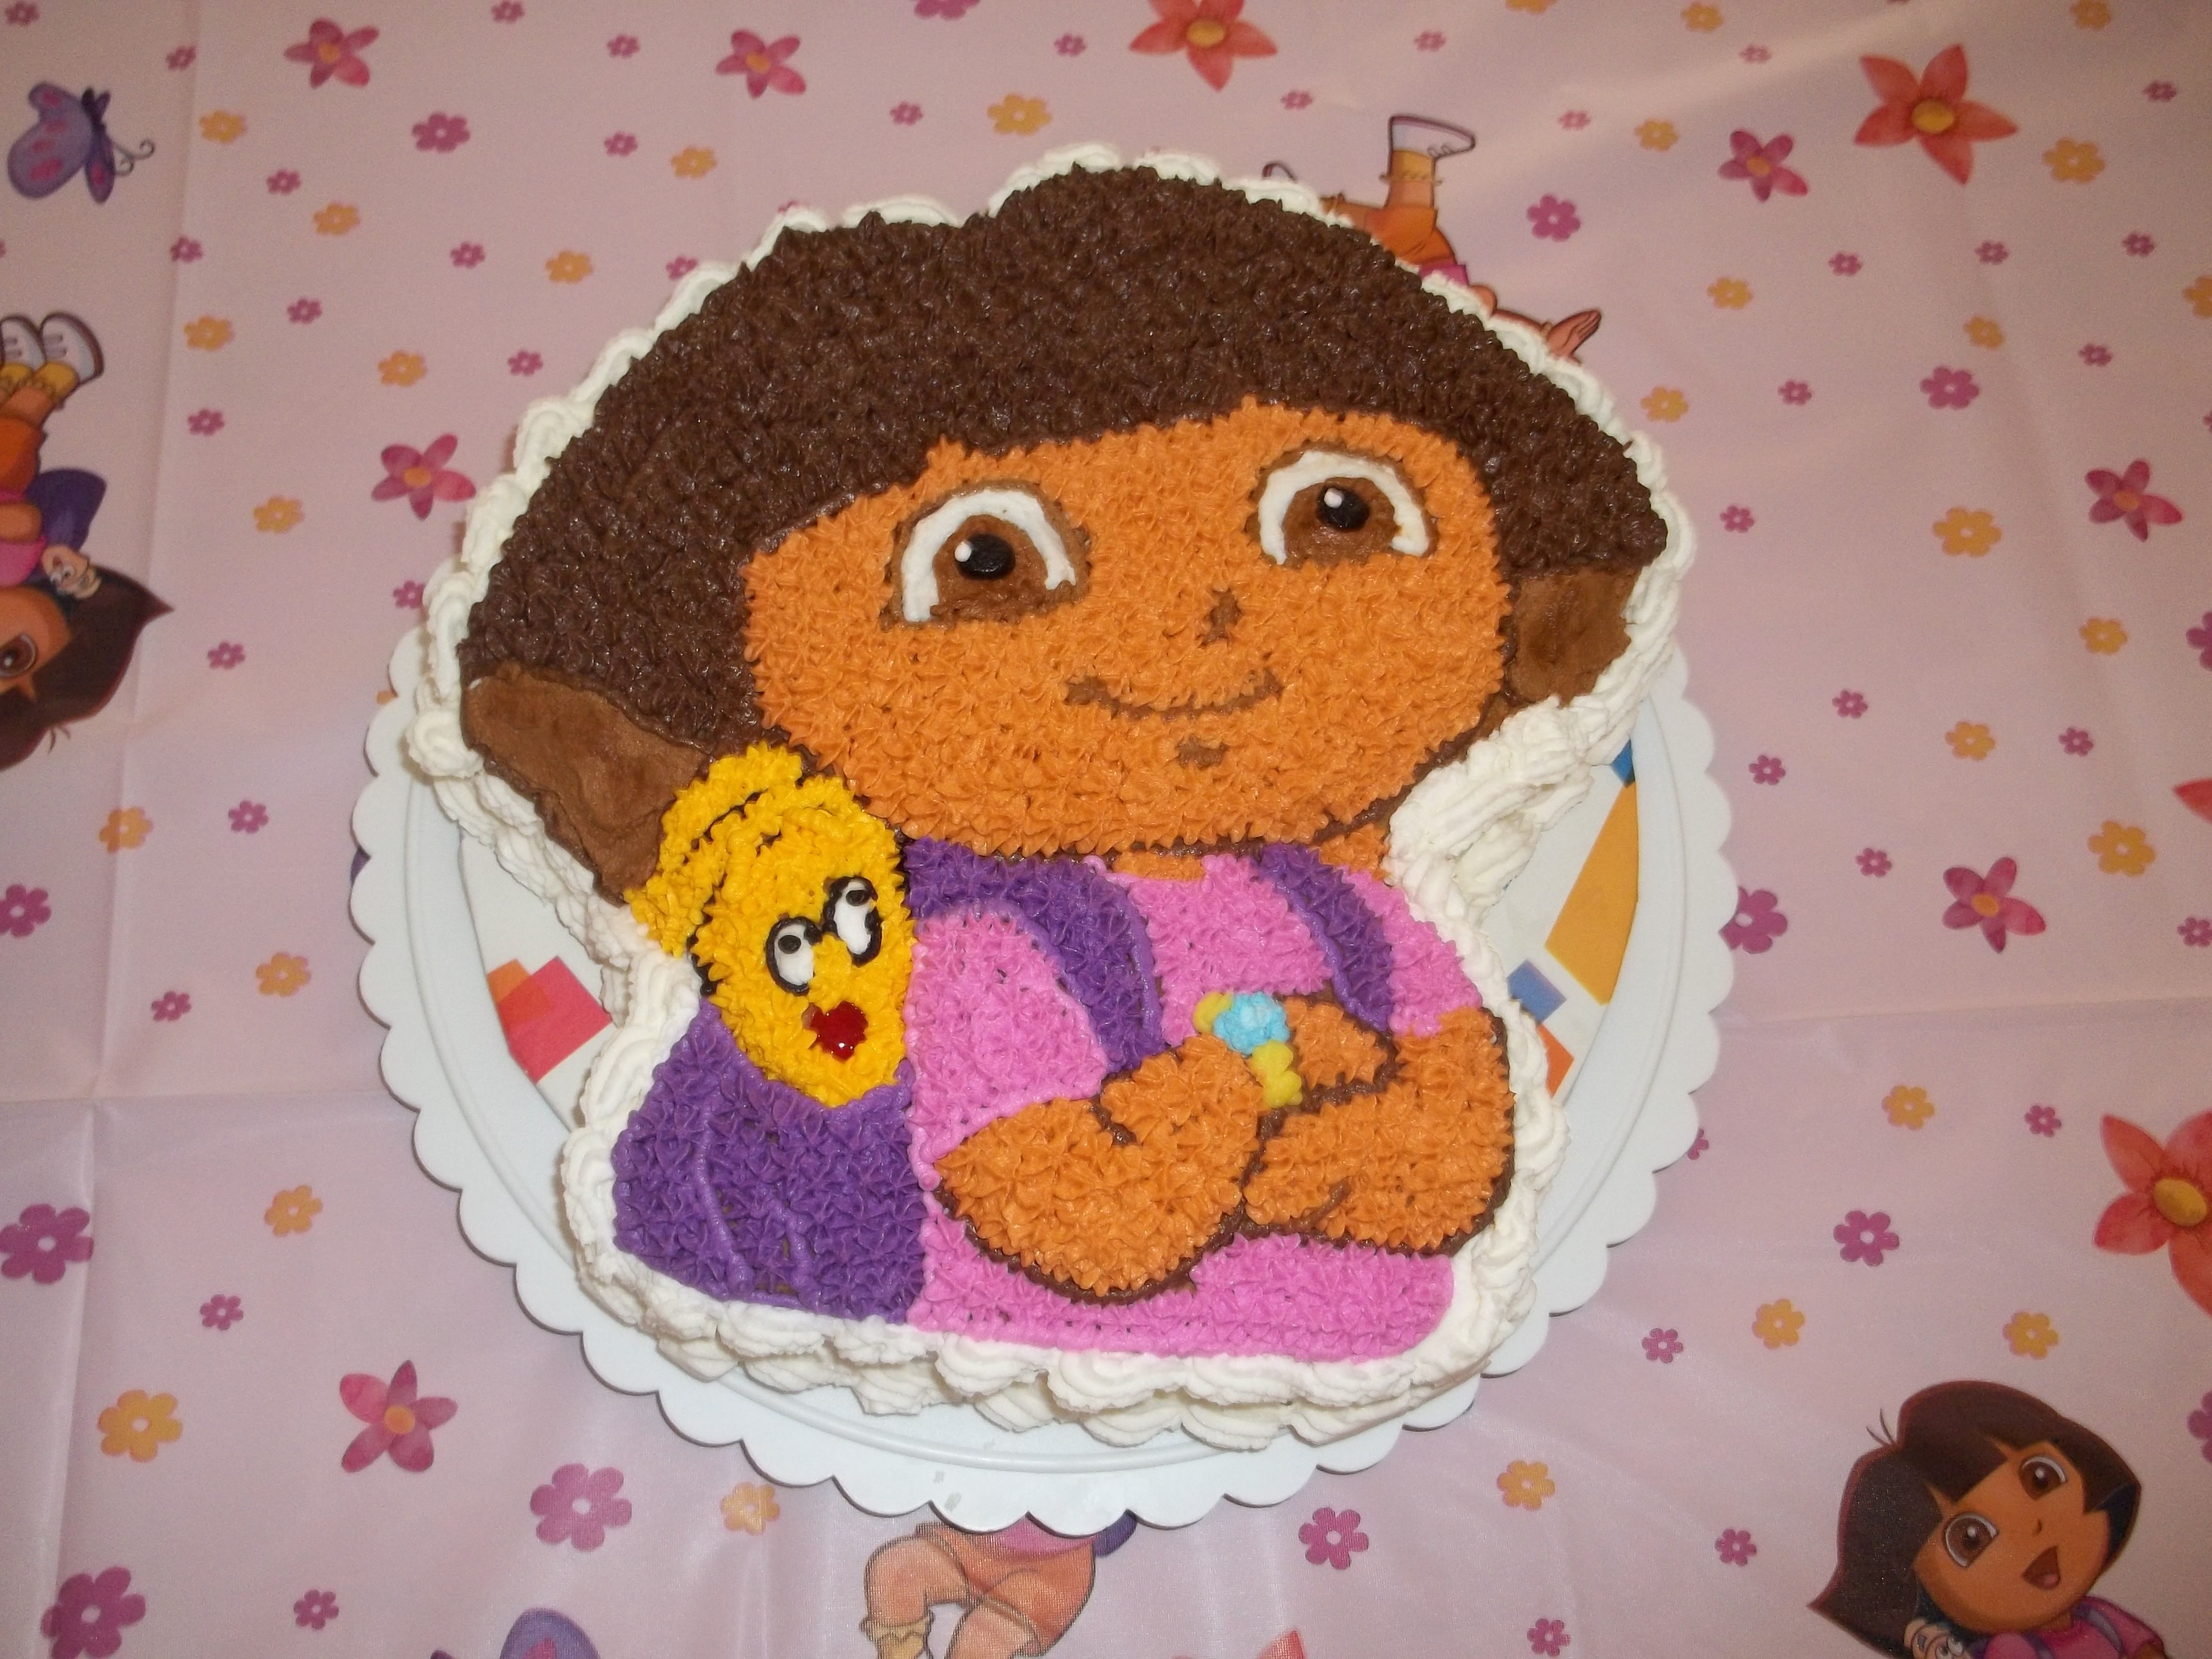 Kroger Sheet Cake Designs : Pin Pin Krogers Birthday Cakes Designs Cake On Pinterest ...